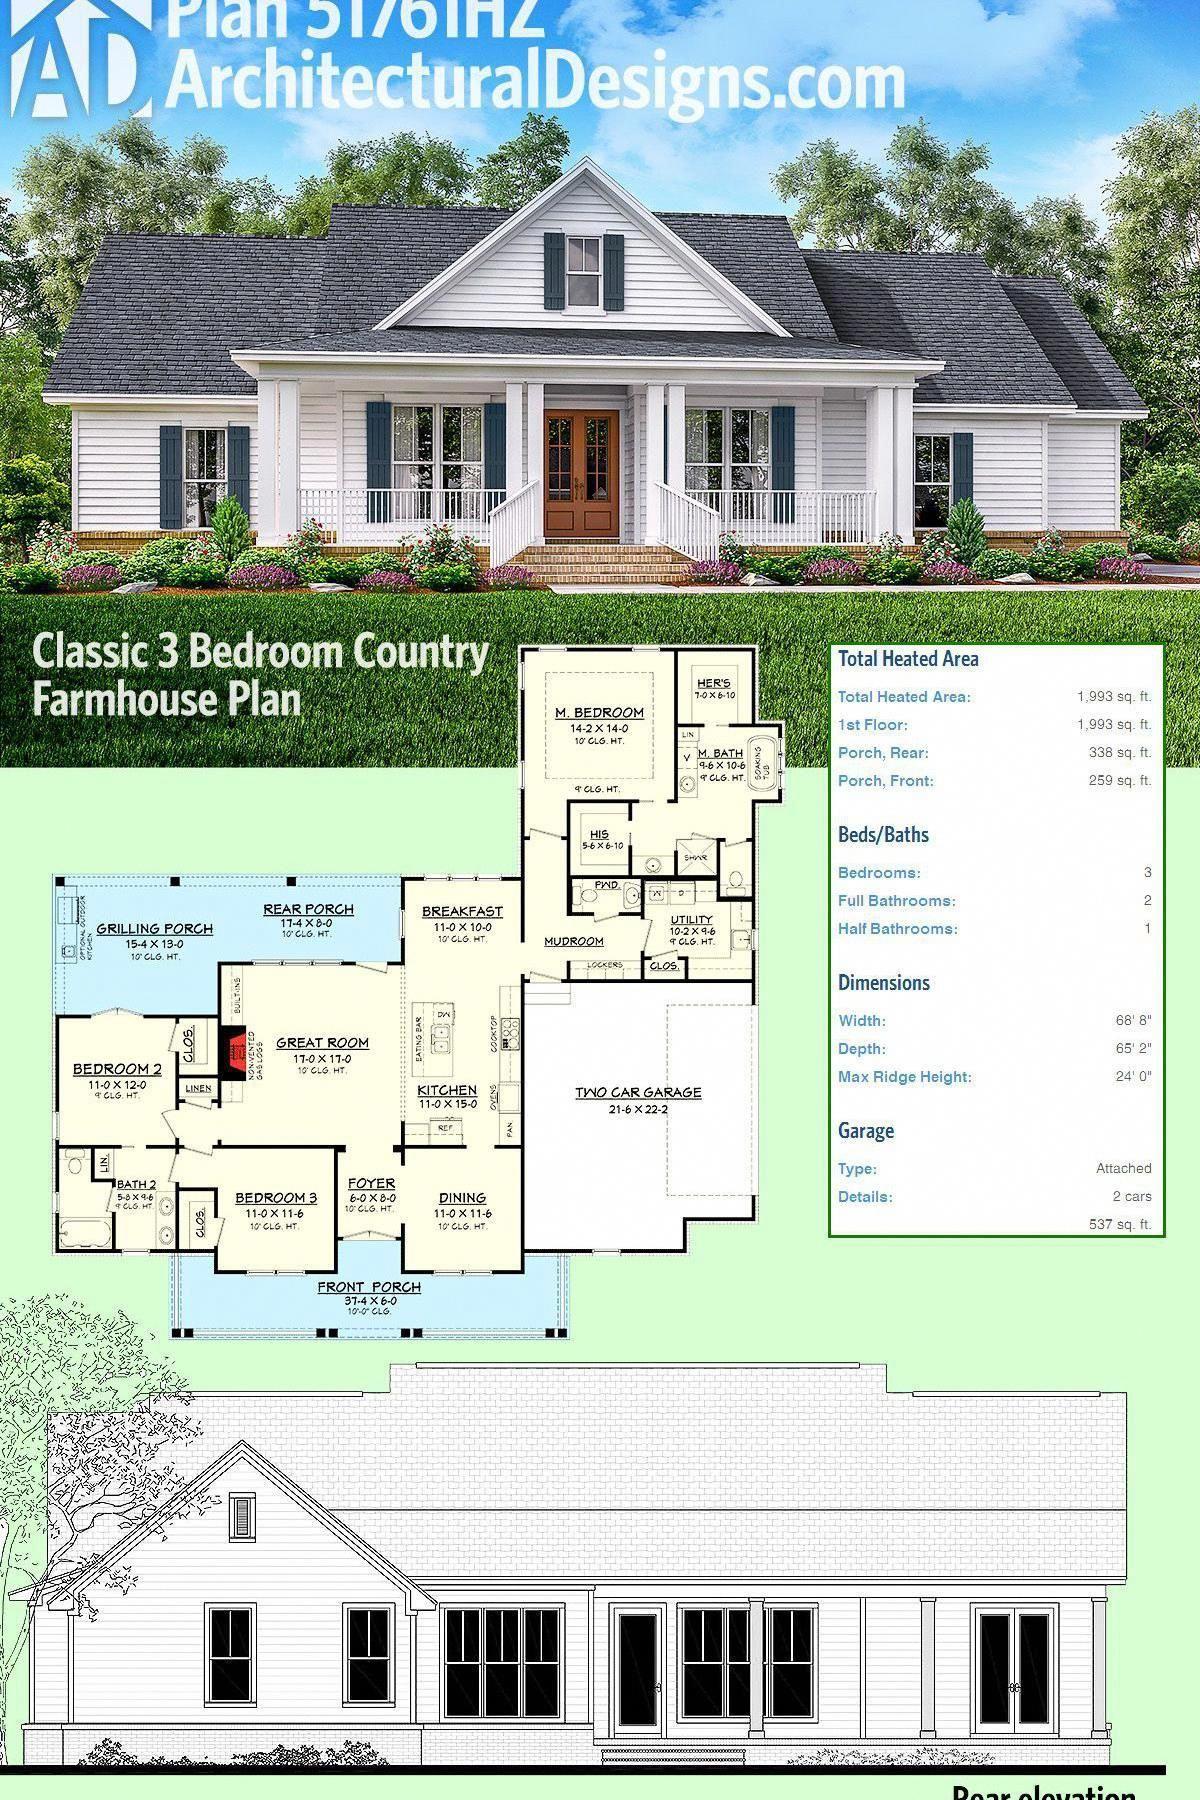 Country Farmhouse Decor Enjoy Countryfarmhousedecor Architectural Design House Plans House Plans Farmhouse Farmhouse Plans